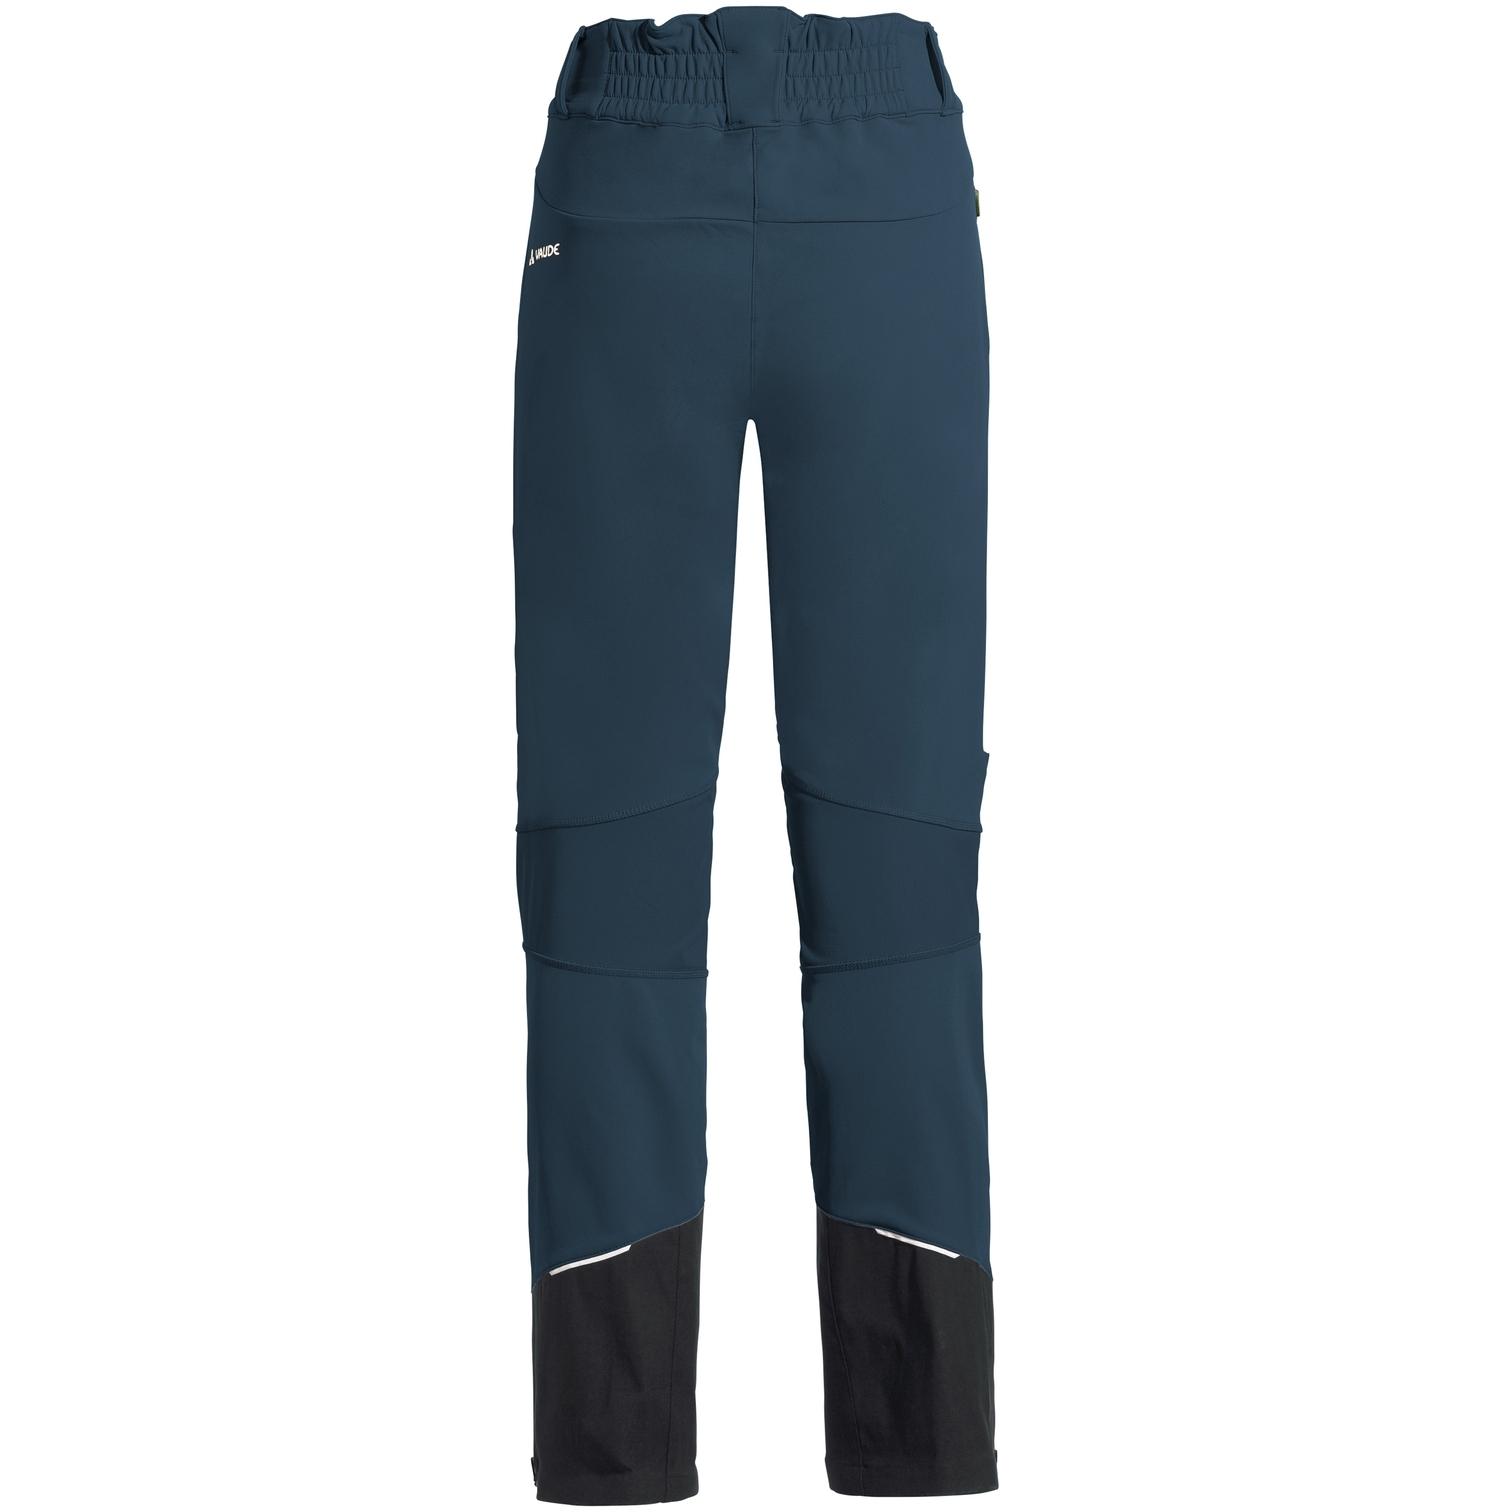 Vaude Women's Larice Pants III - dark sea